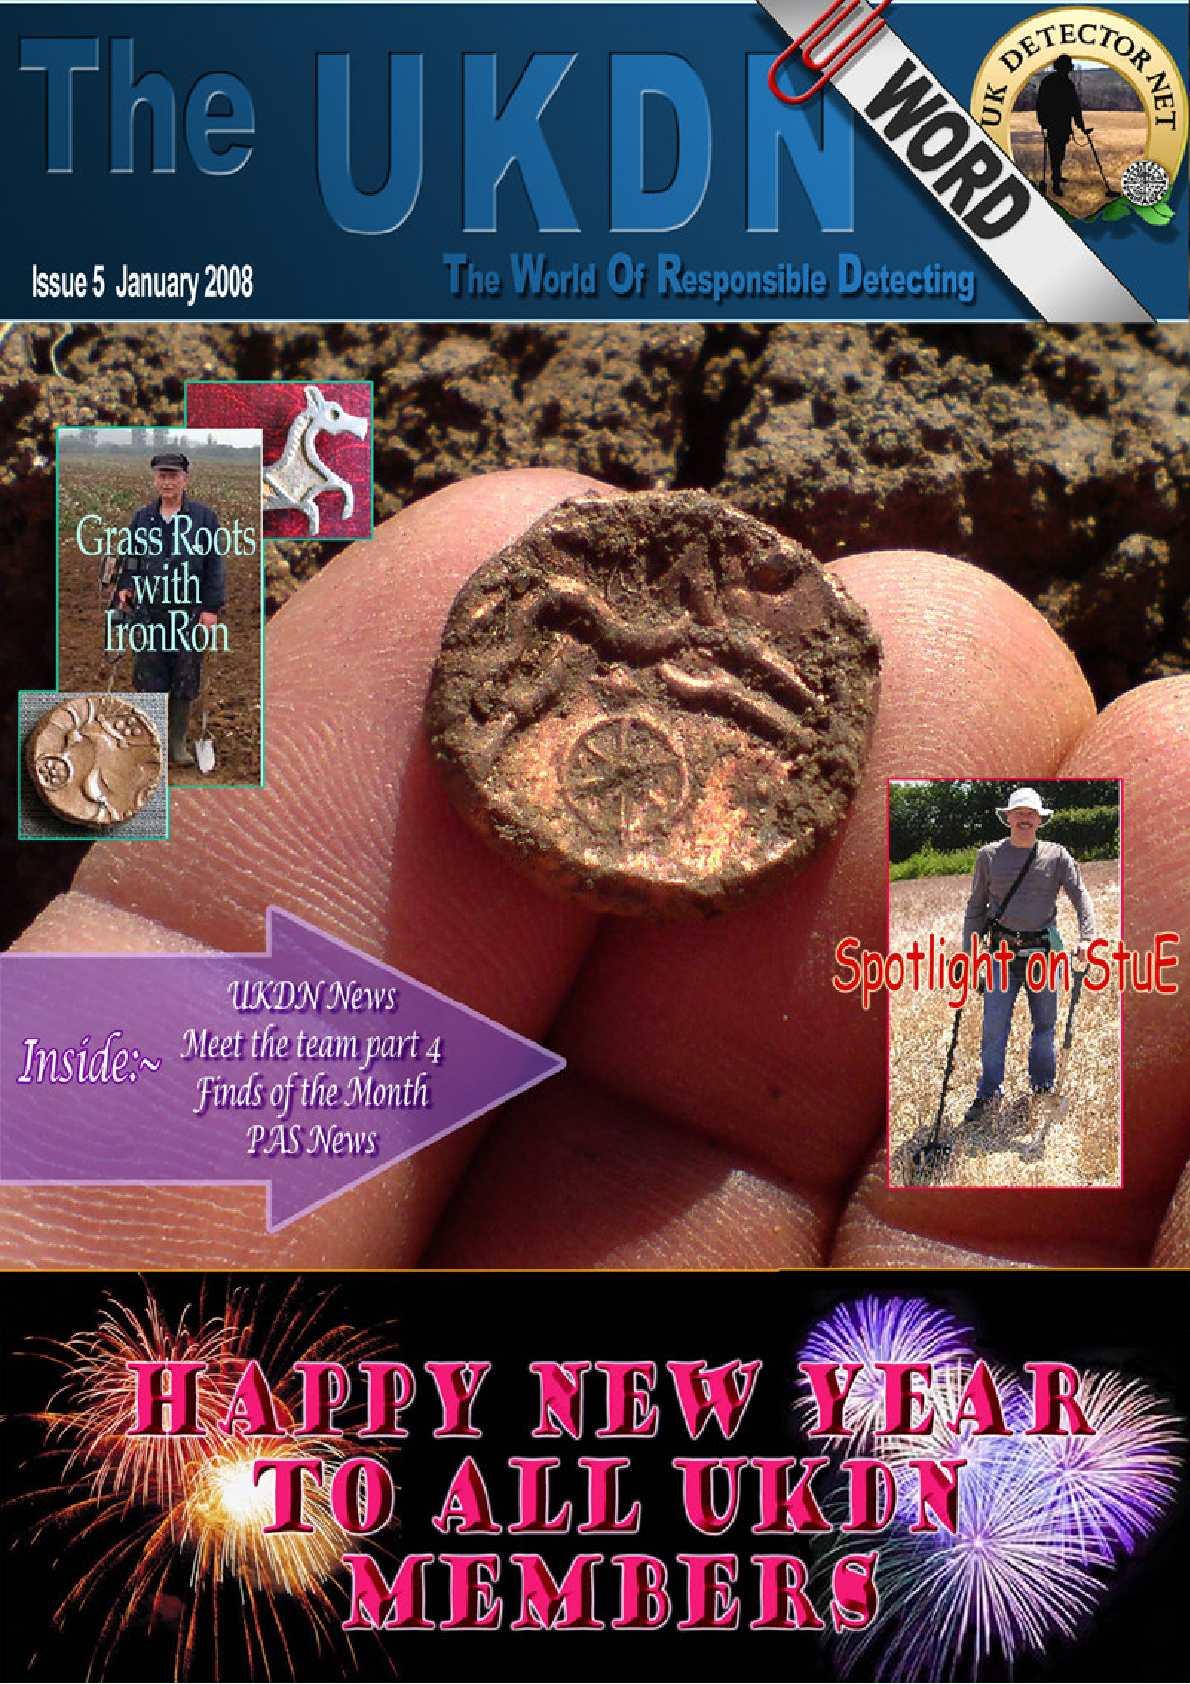 UKDN Word Issue 5 January 2008